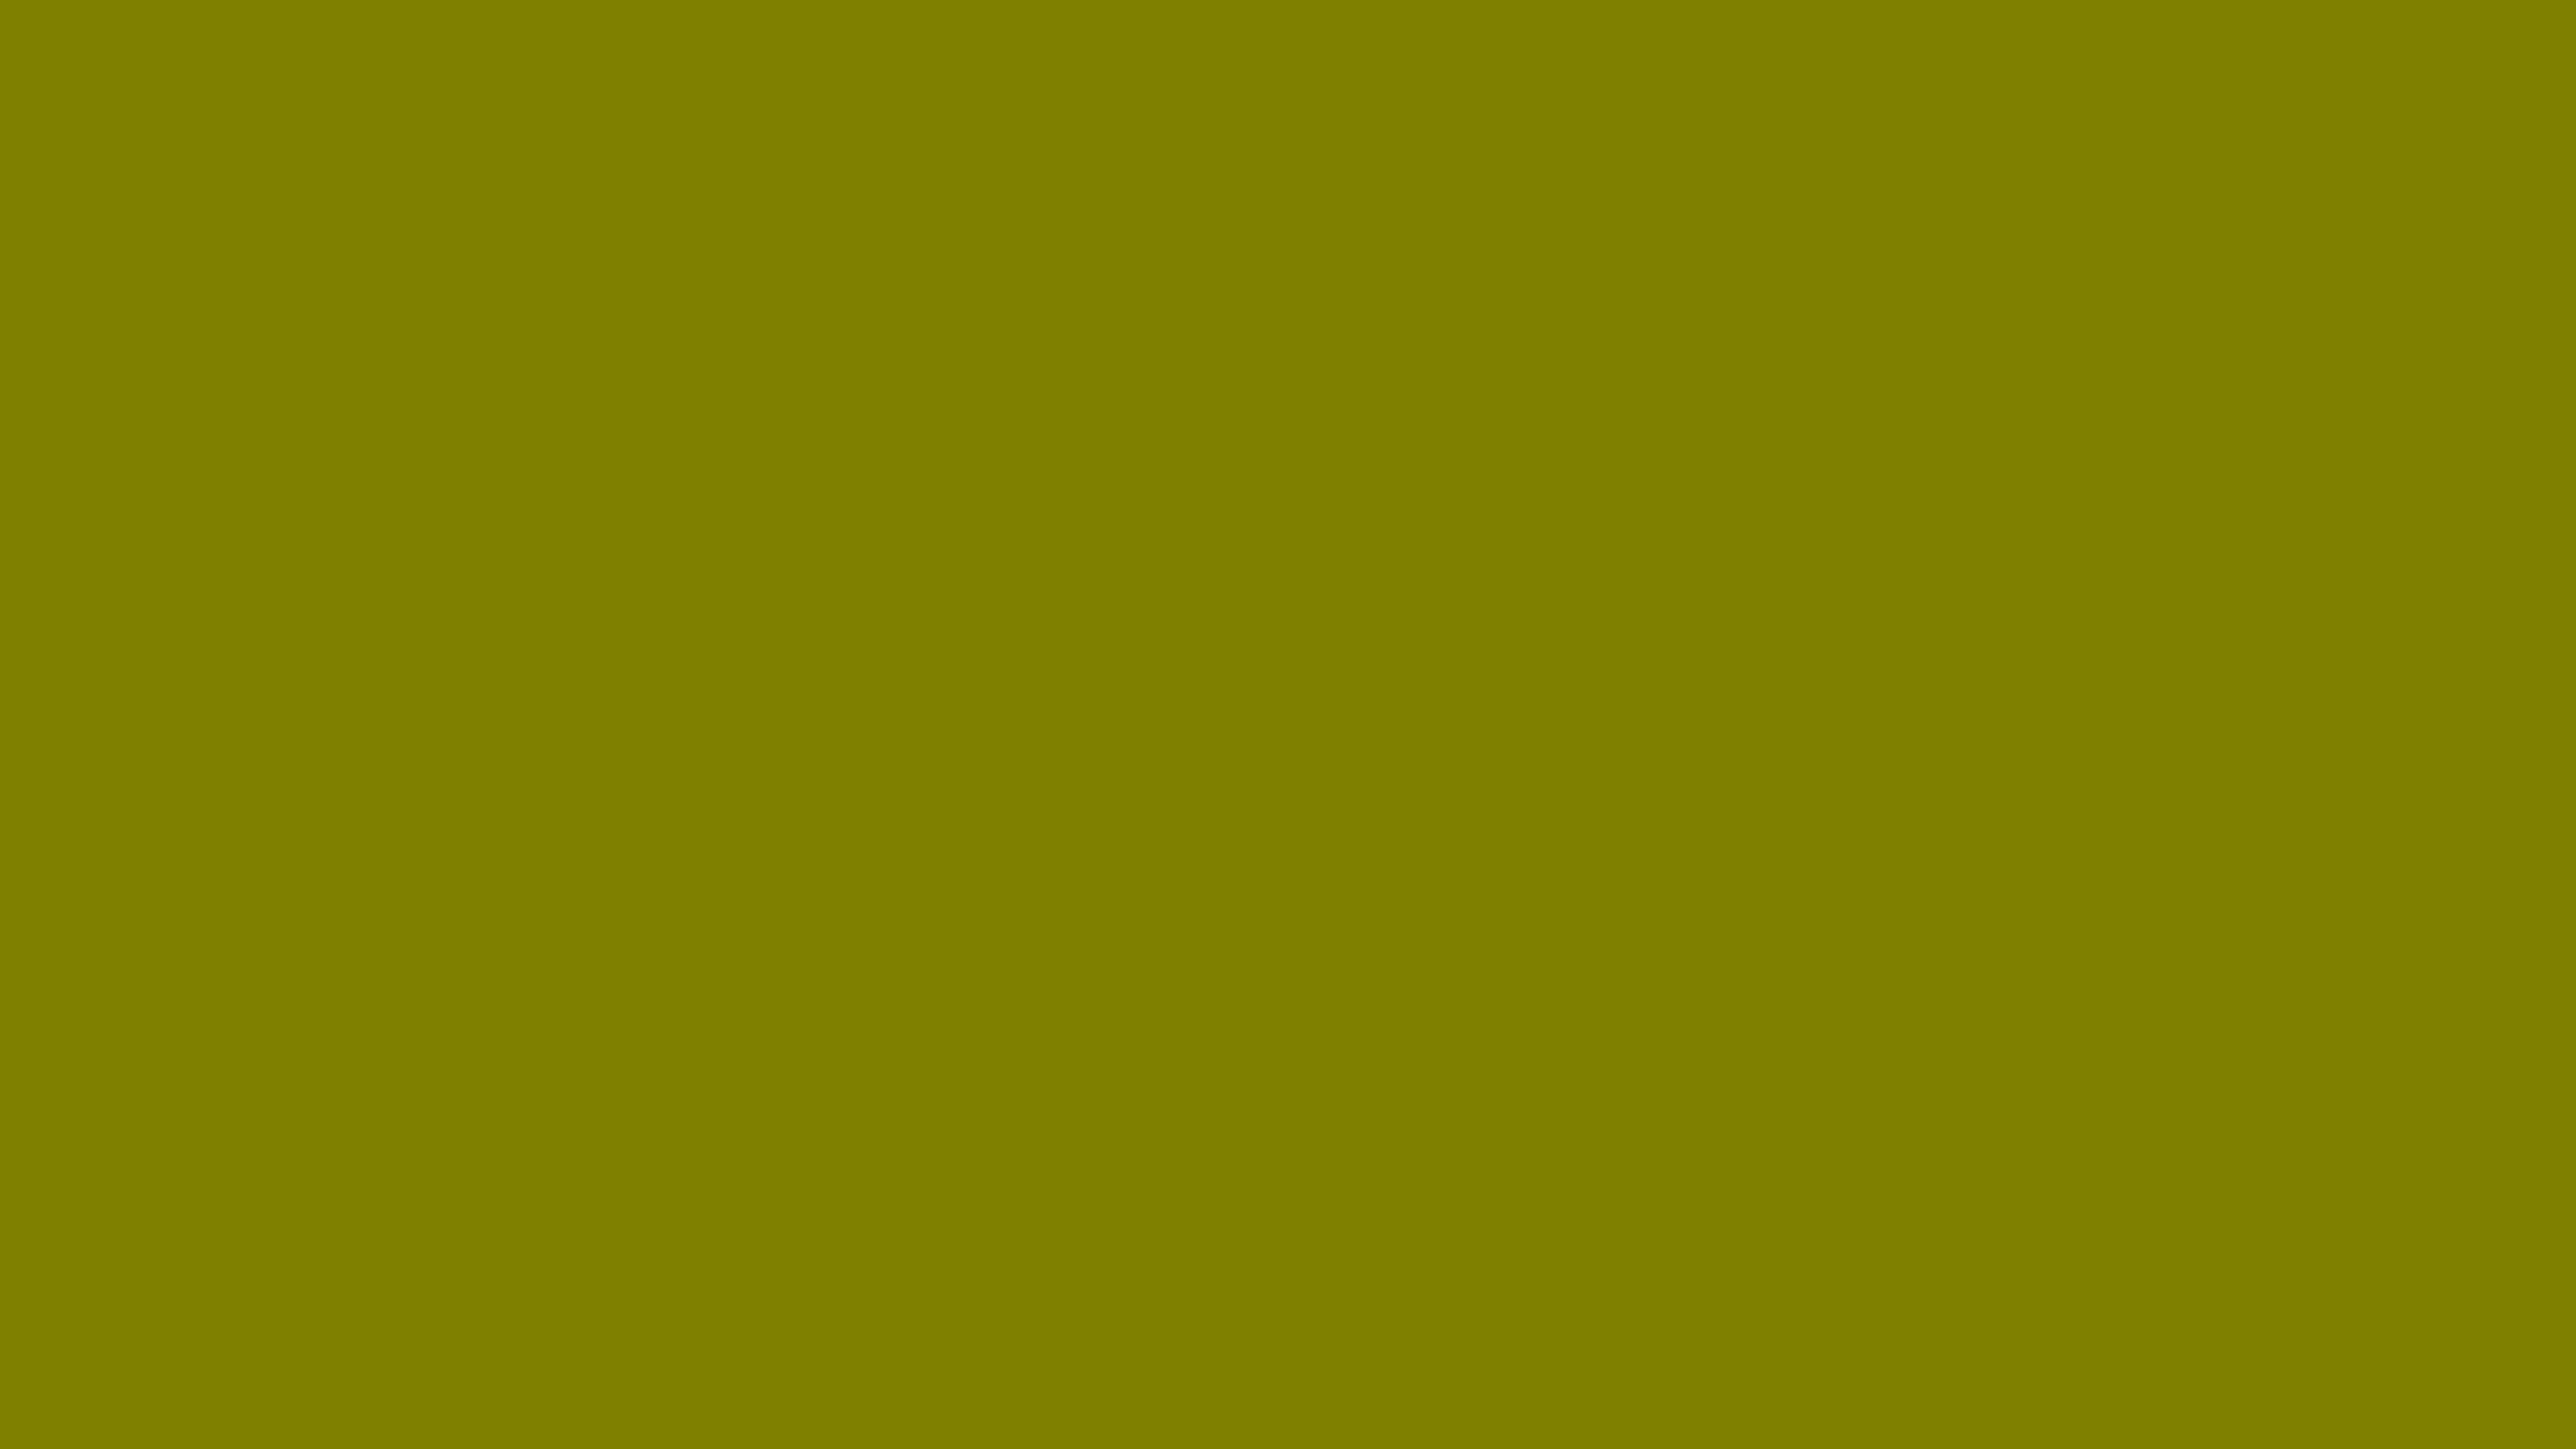 4096x2304 Olive Solid Color Background